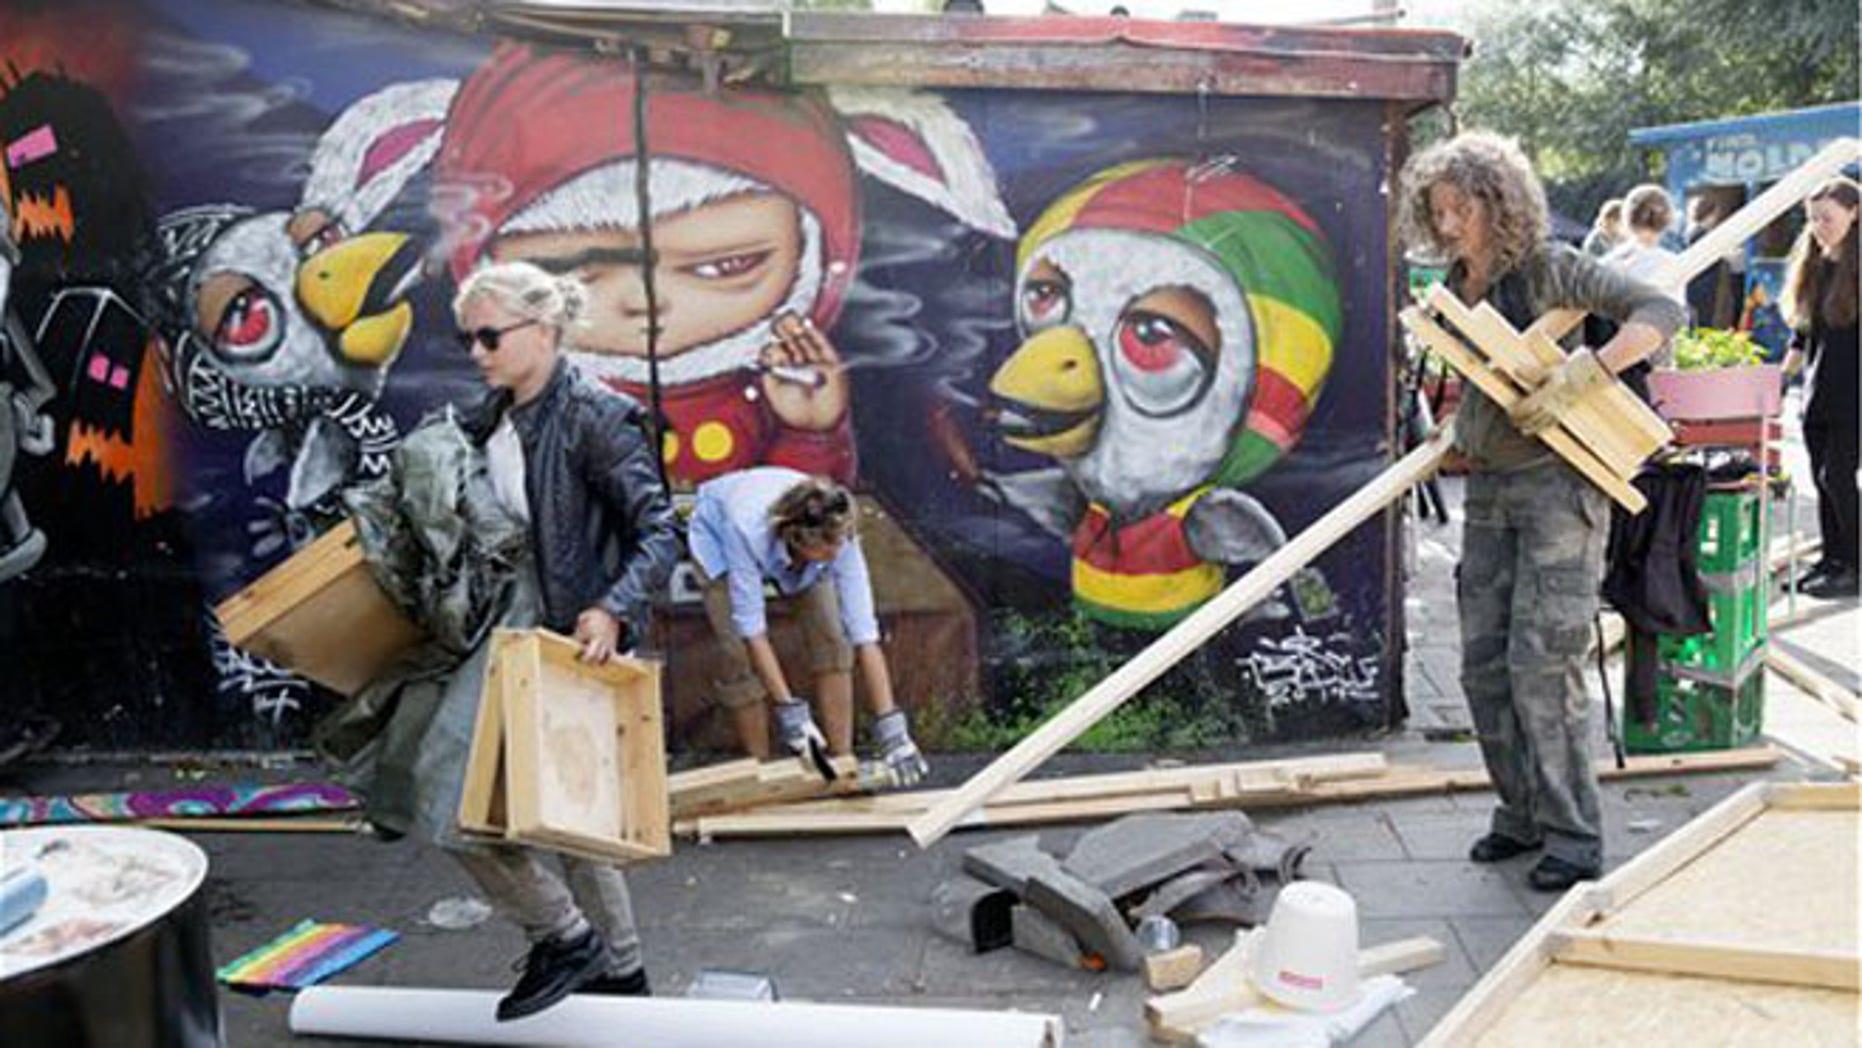 Residents of Christiania remove the illegal hashish stalls in Pusher Street, Copenhagen on Friday, Sept 2, 2016. (Thomas Borberg/ AP via POLFOTO)